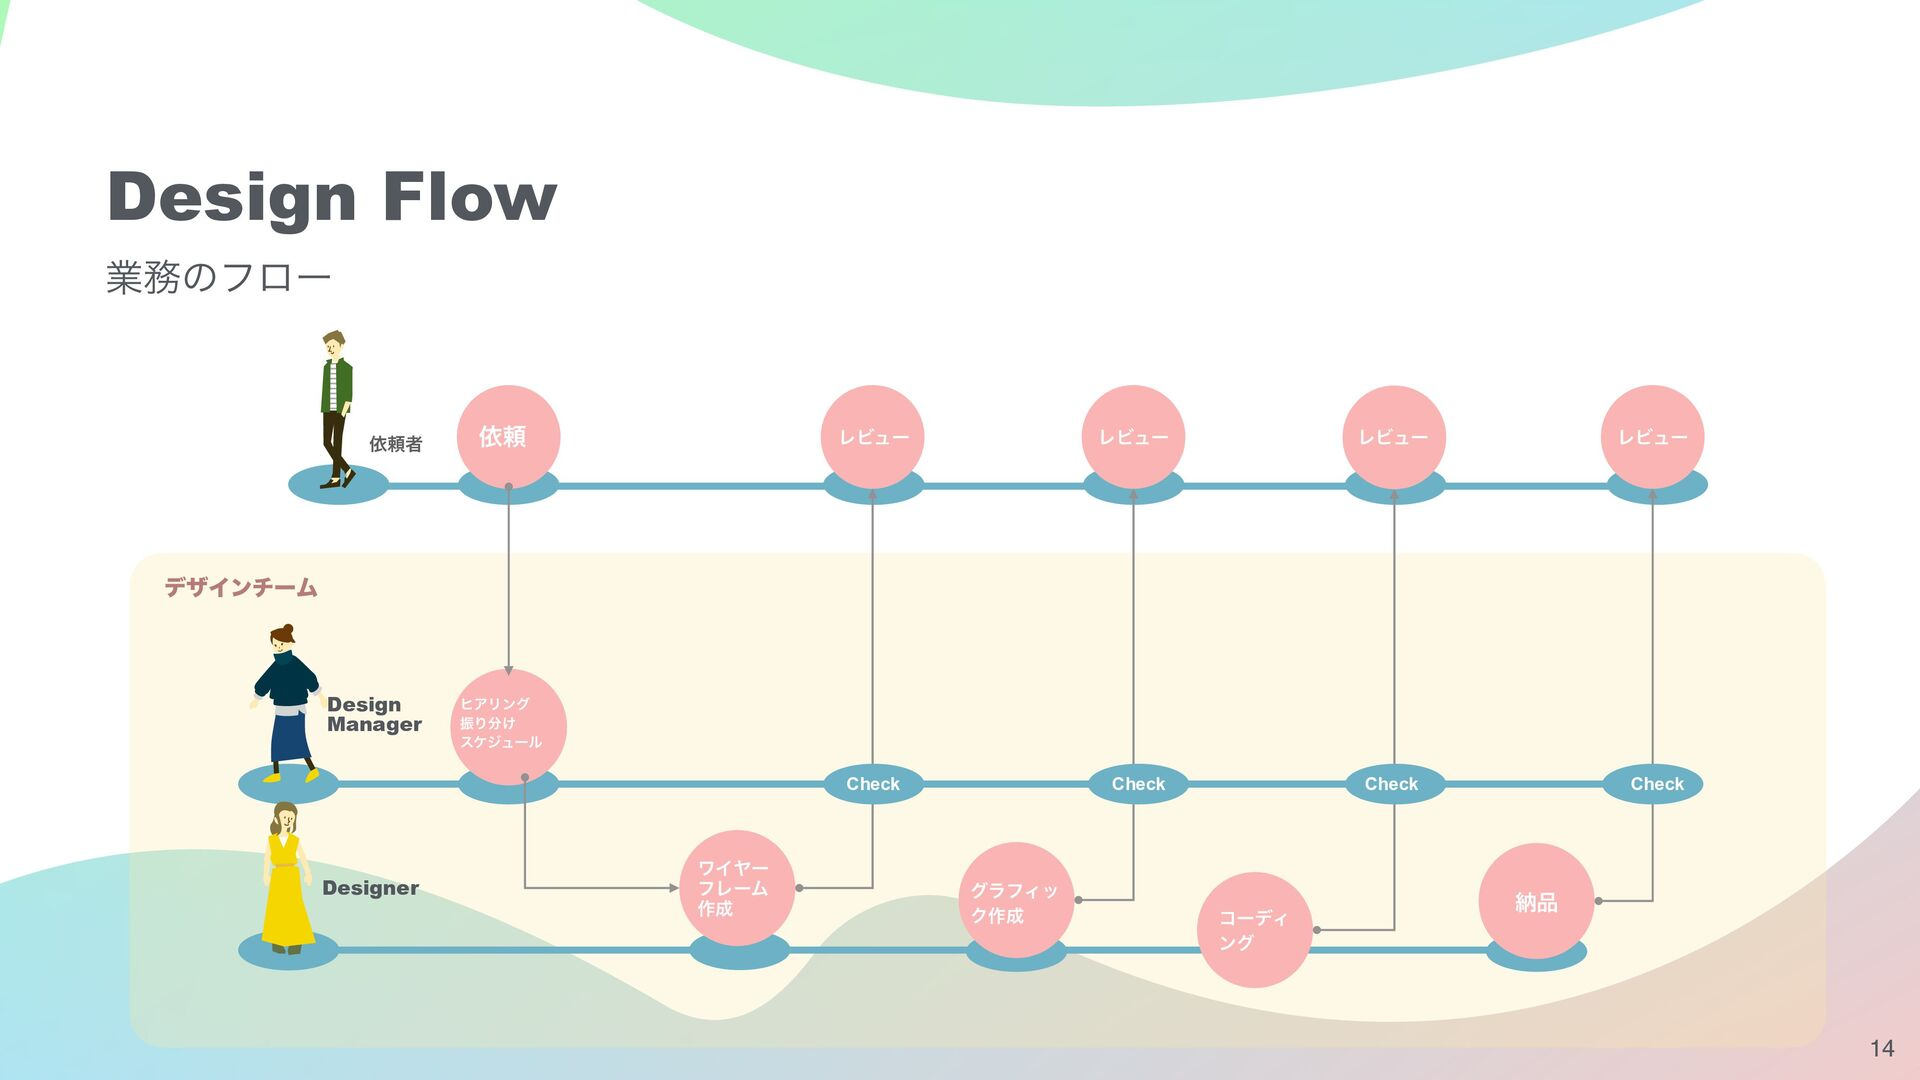 Design Area for Designers デザイナーに求めるデザイン領域 体験設計 ...